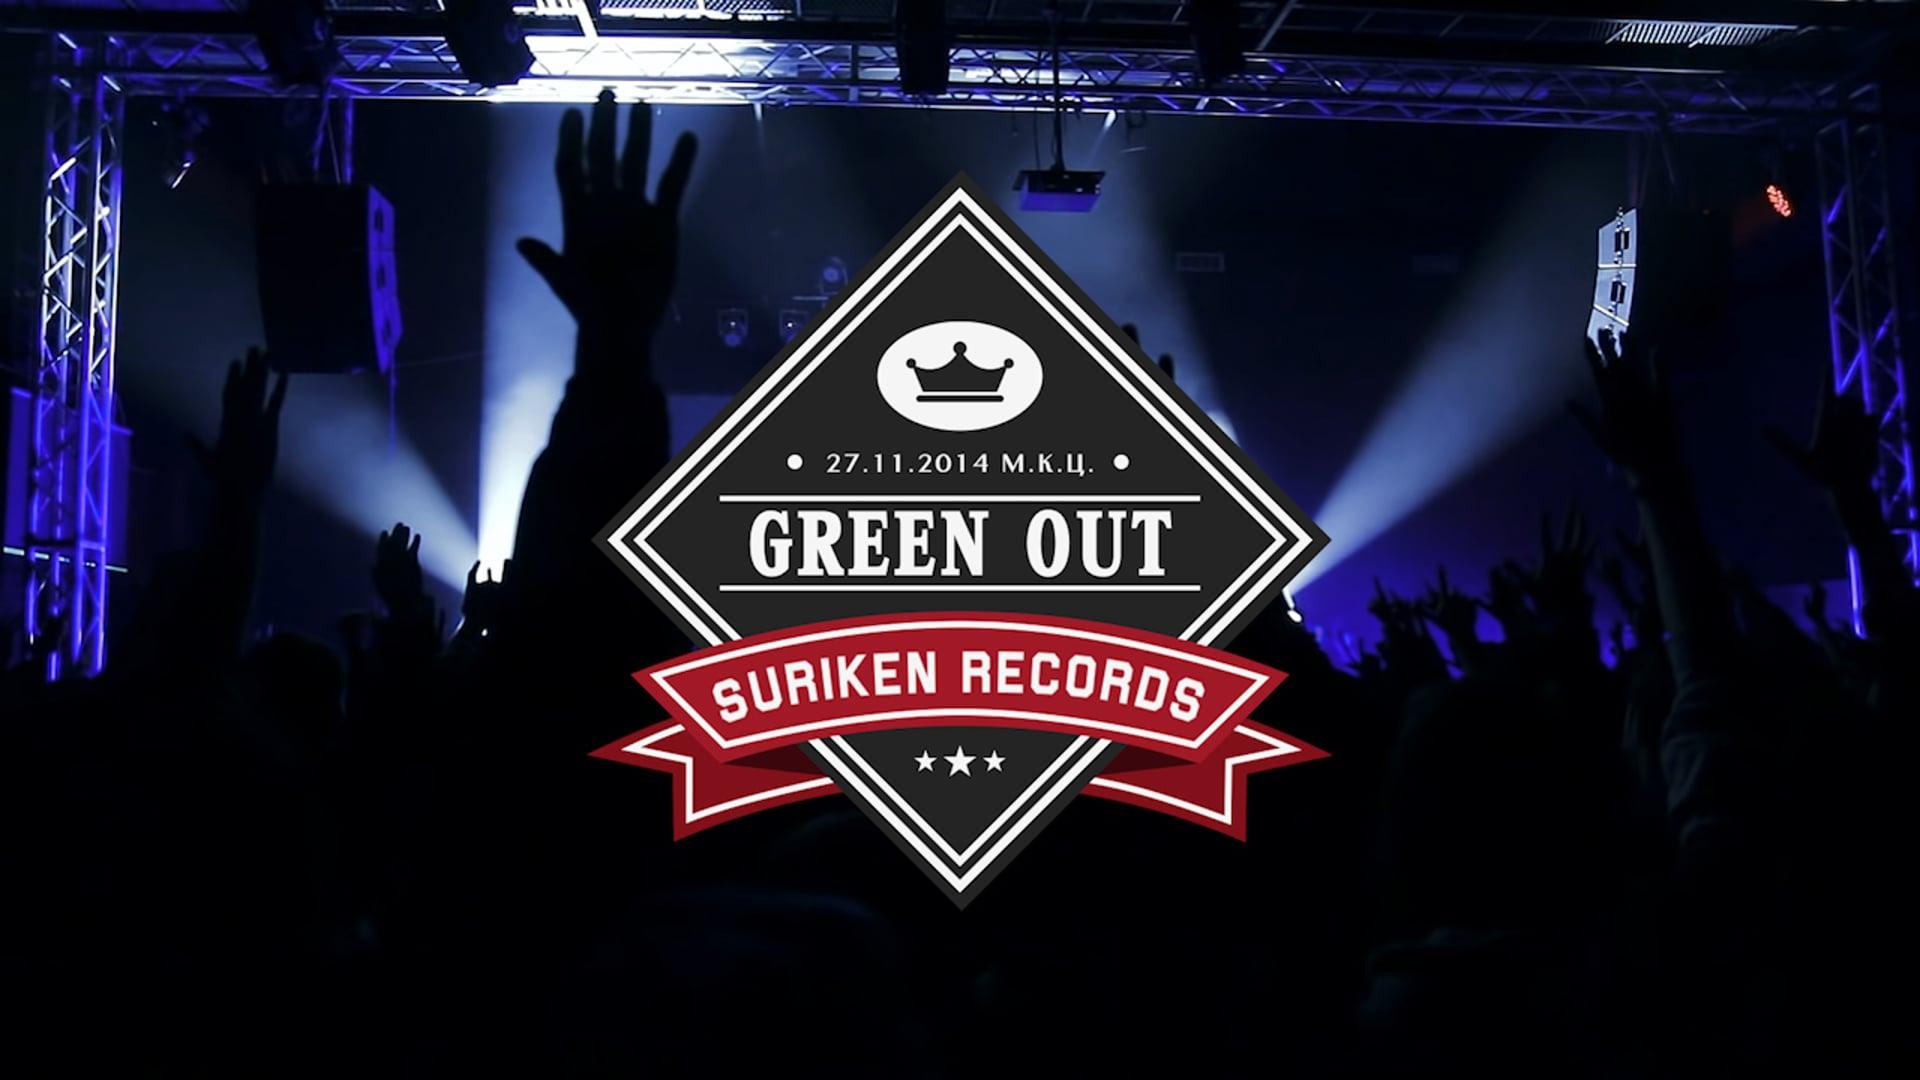 Green Out - Rap Lee (Live @ M.K.C. 2014)